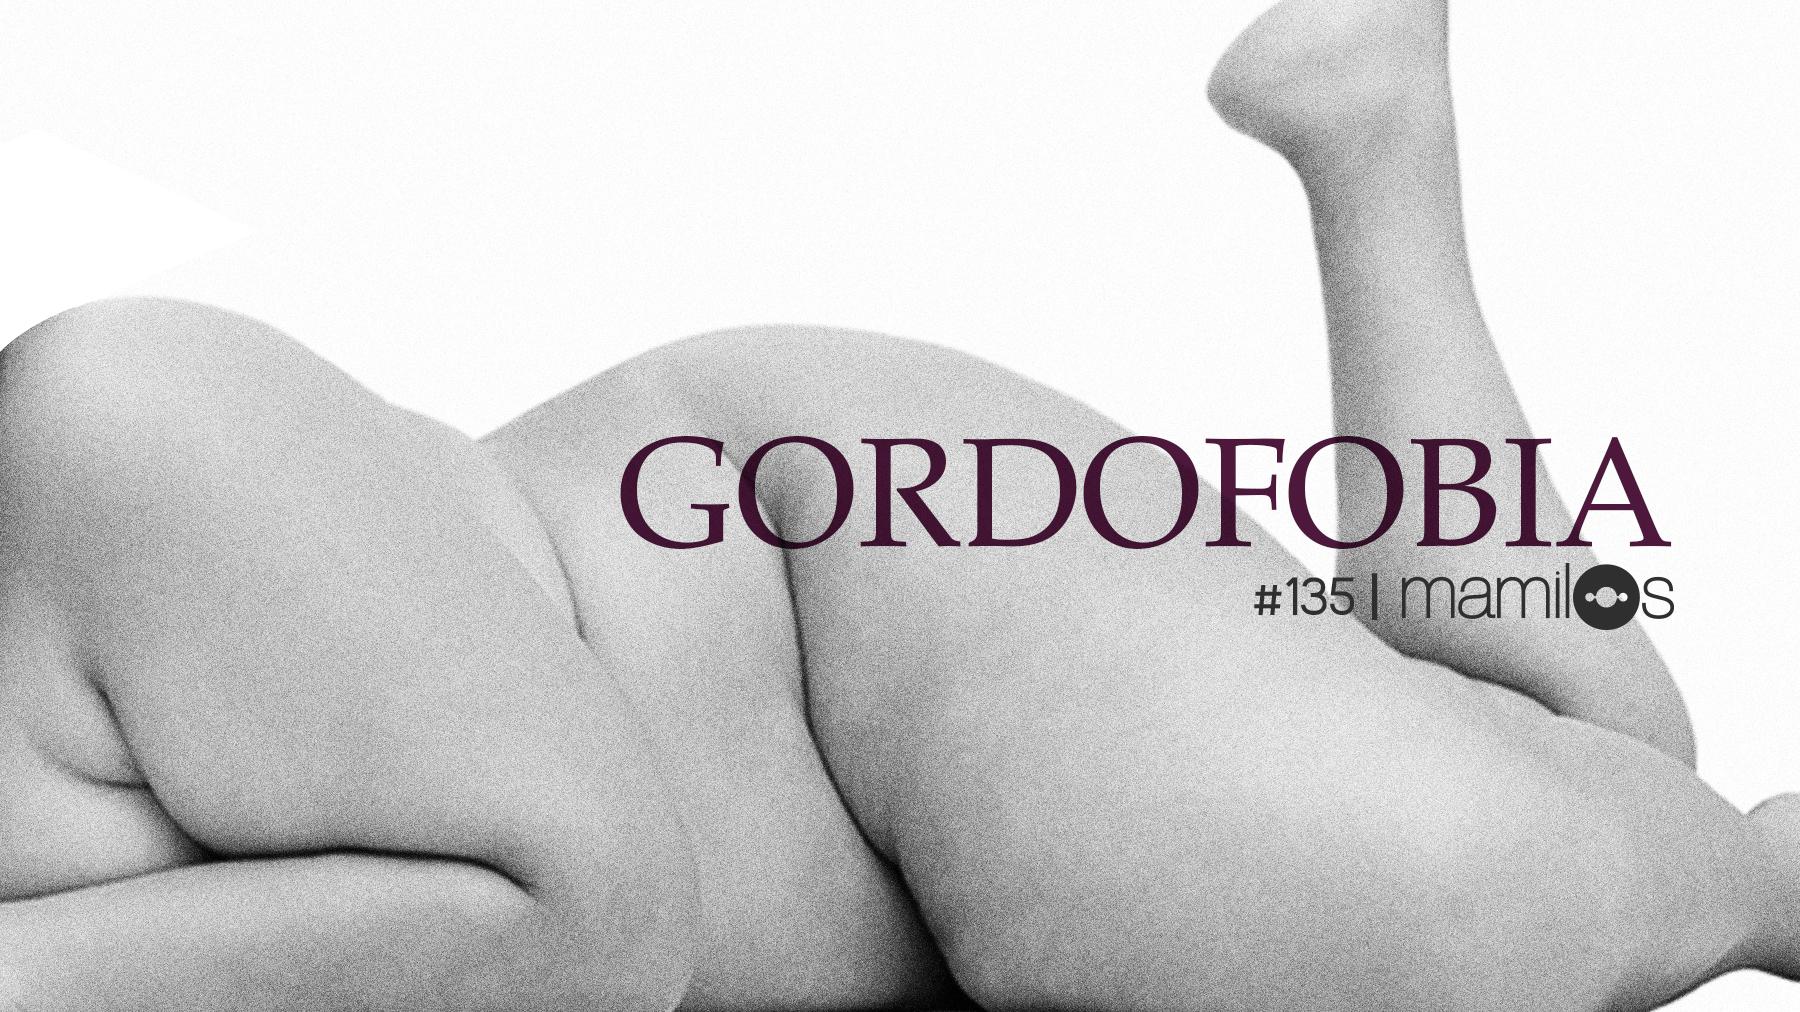 Mamilos 135 – Gordofobia